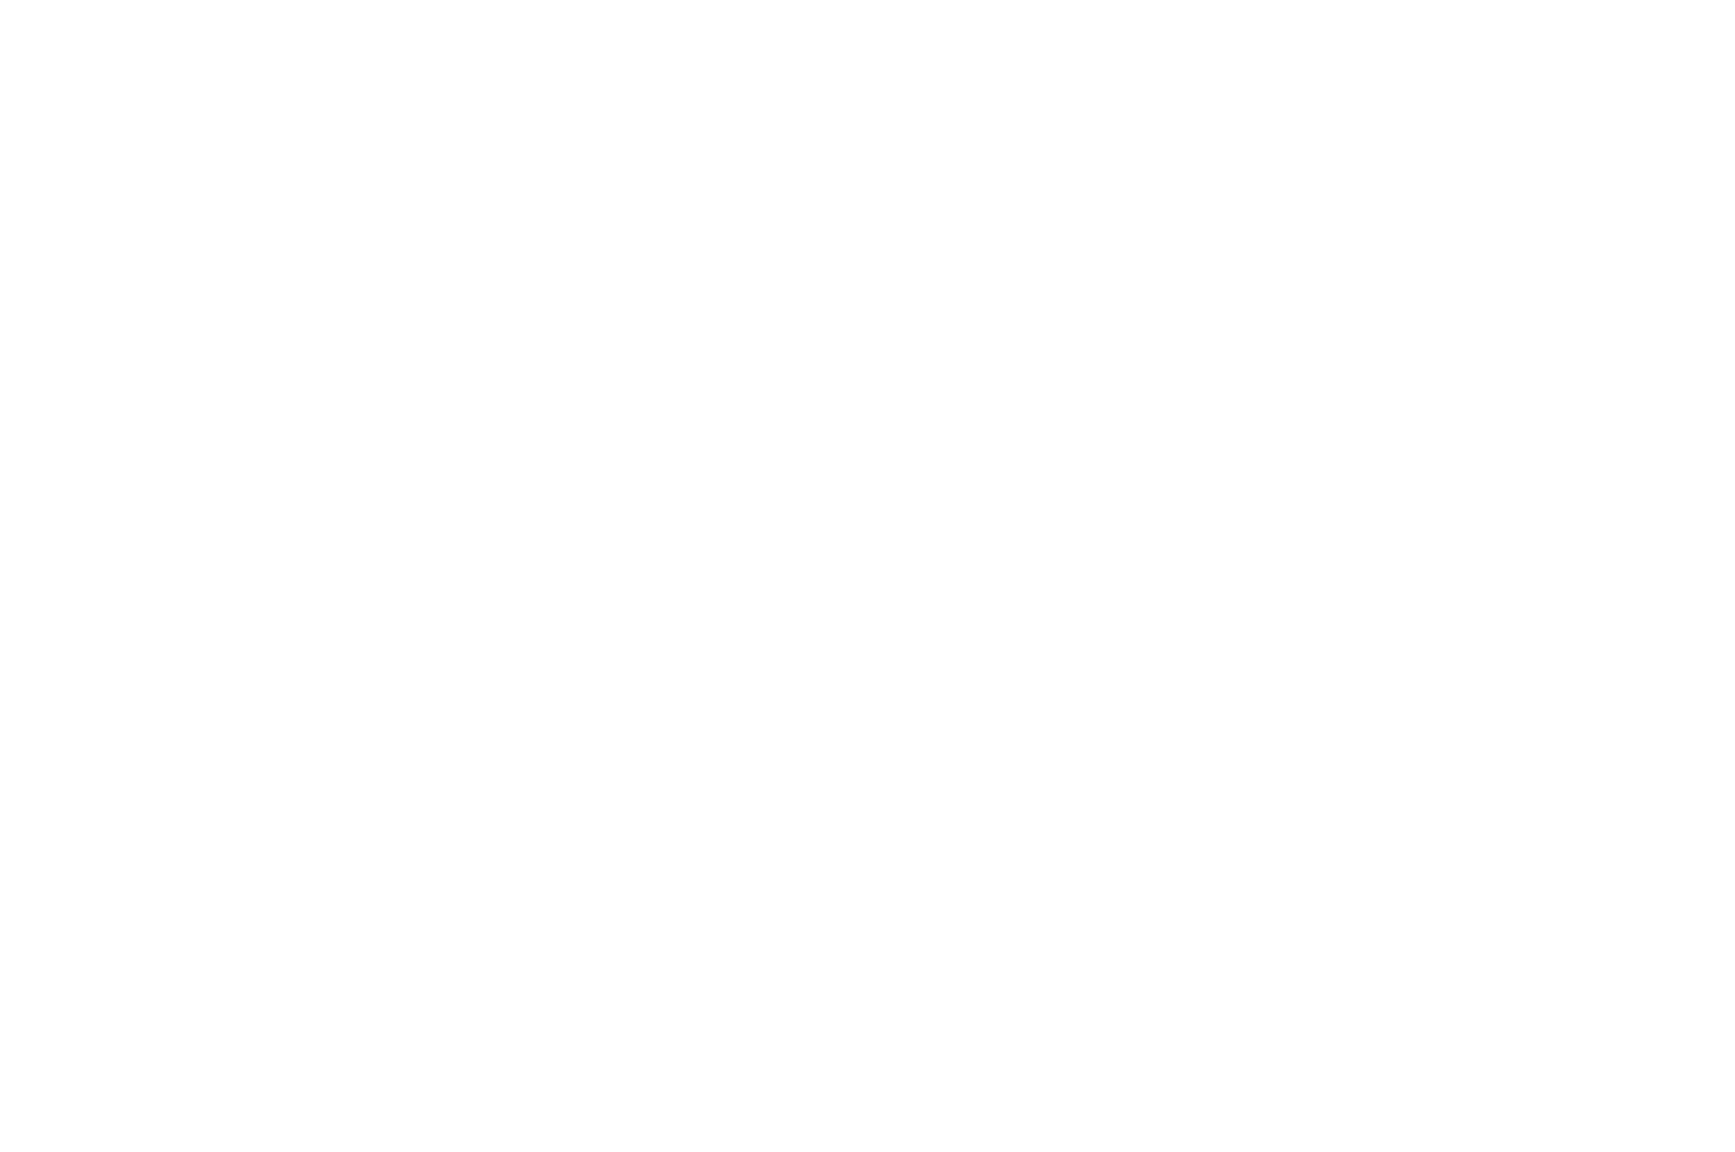 Hagyaték BEST SHORT FILM - Shoham Film Festival - 2021 (1)